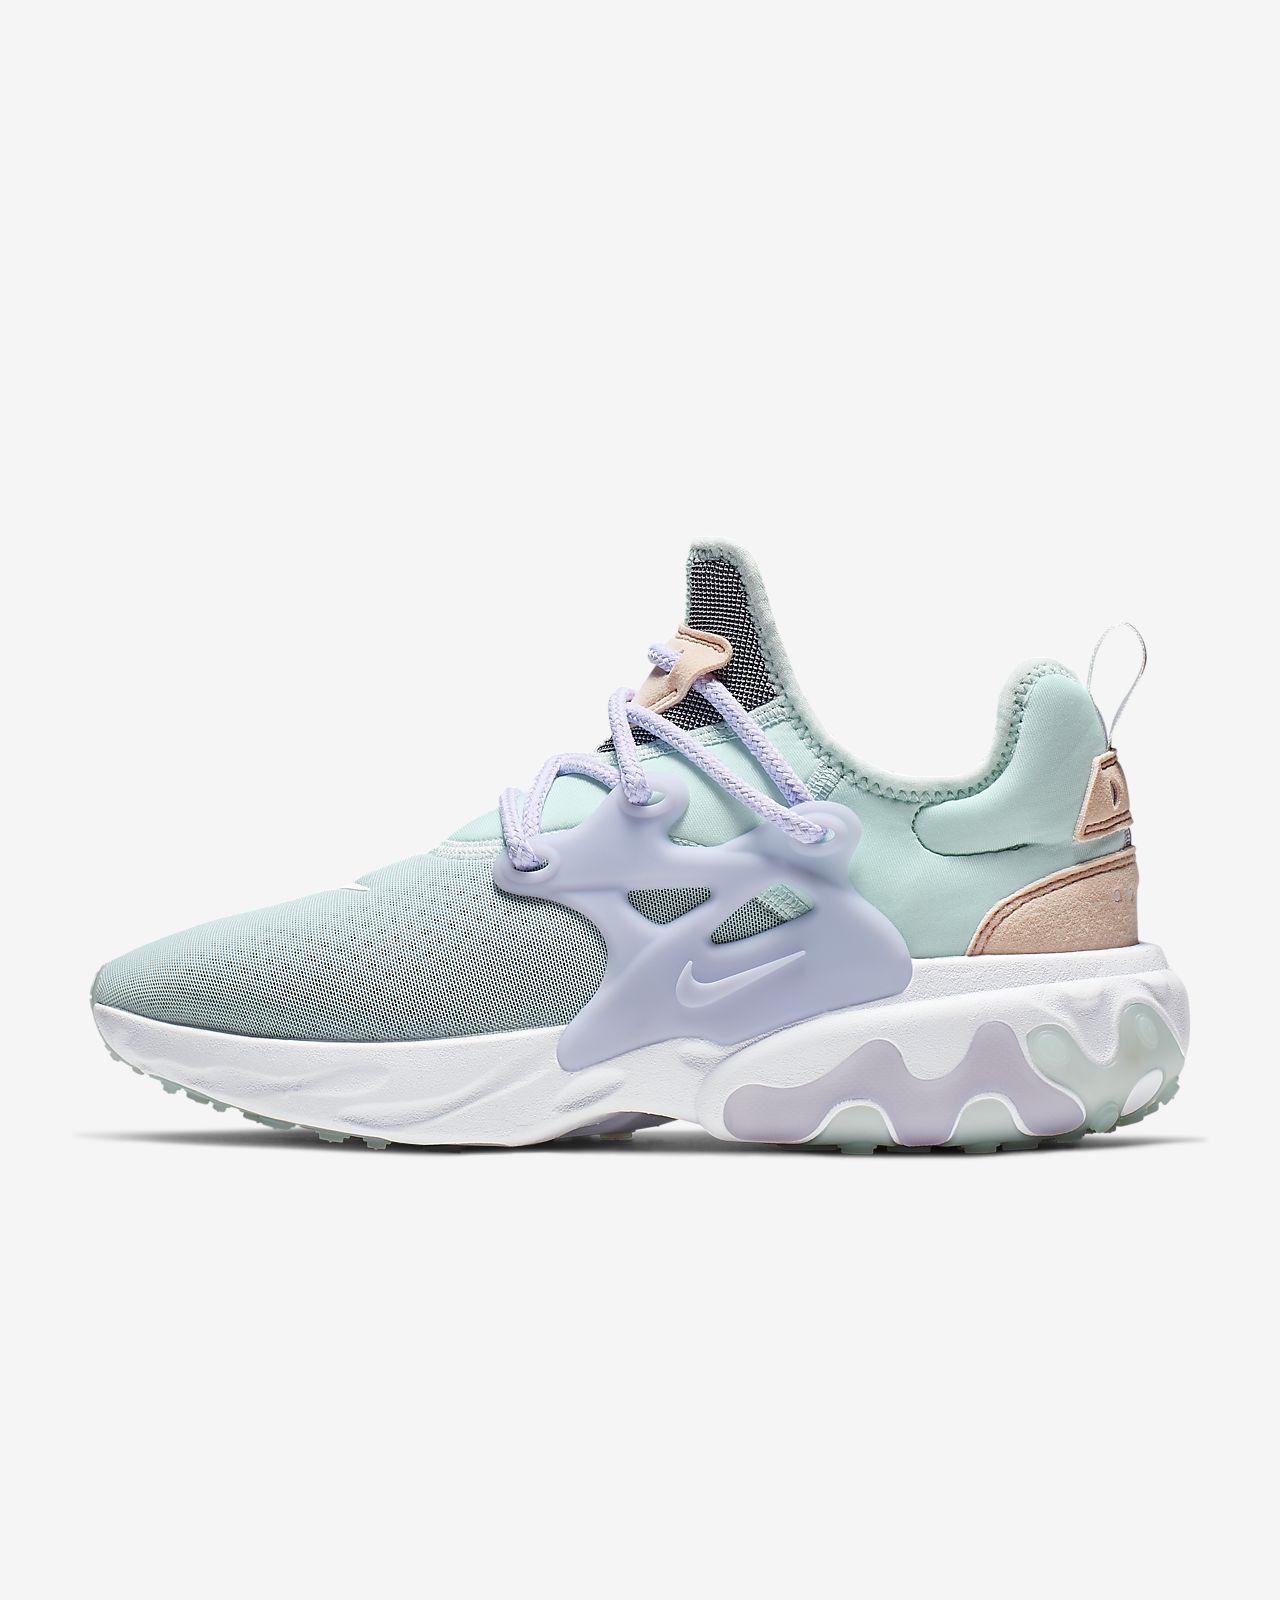 new style c6a16 90828 ... Nike React Presto Women s Shoe